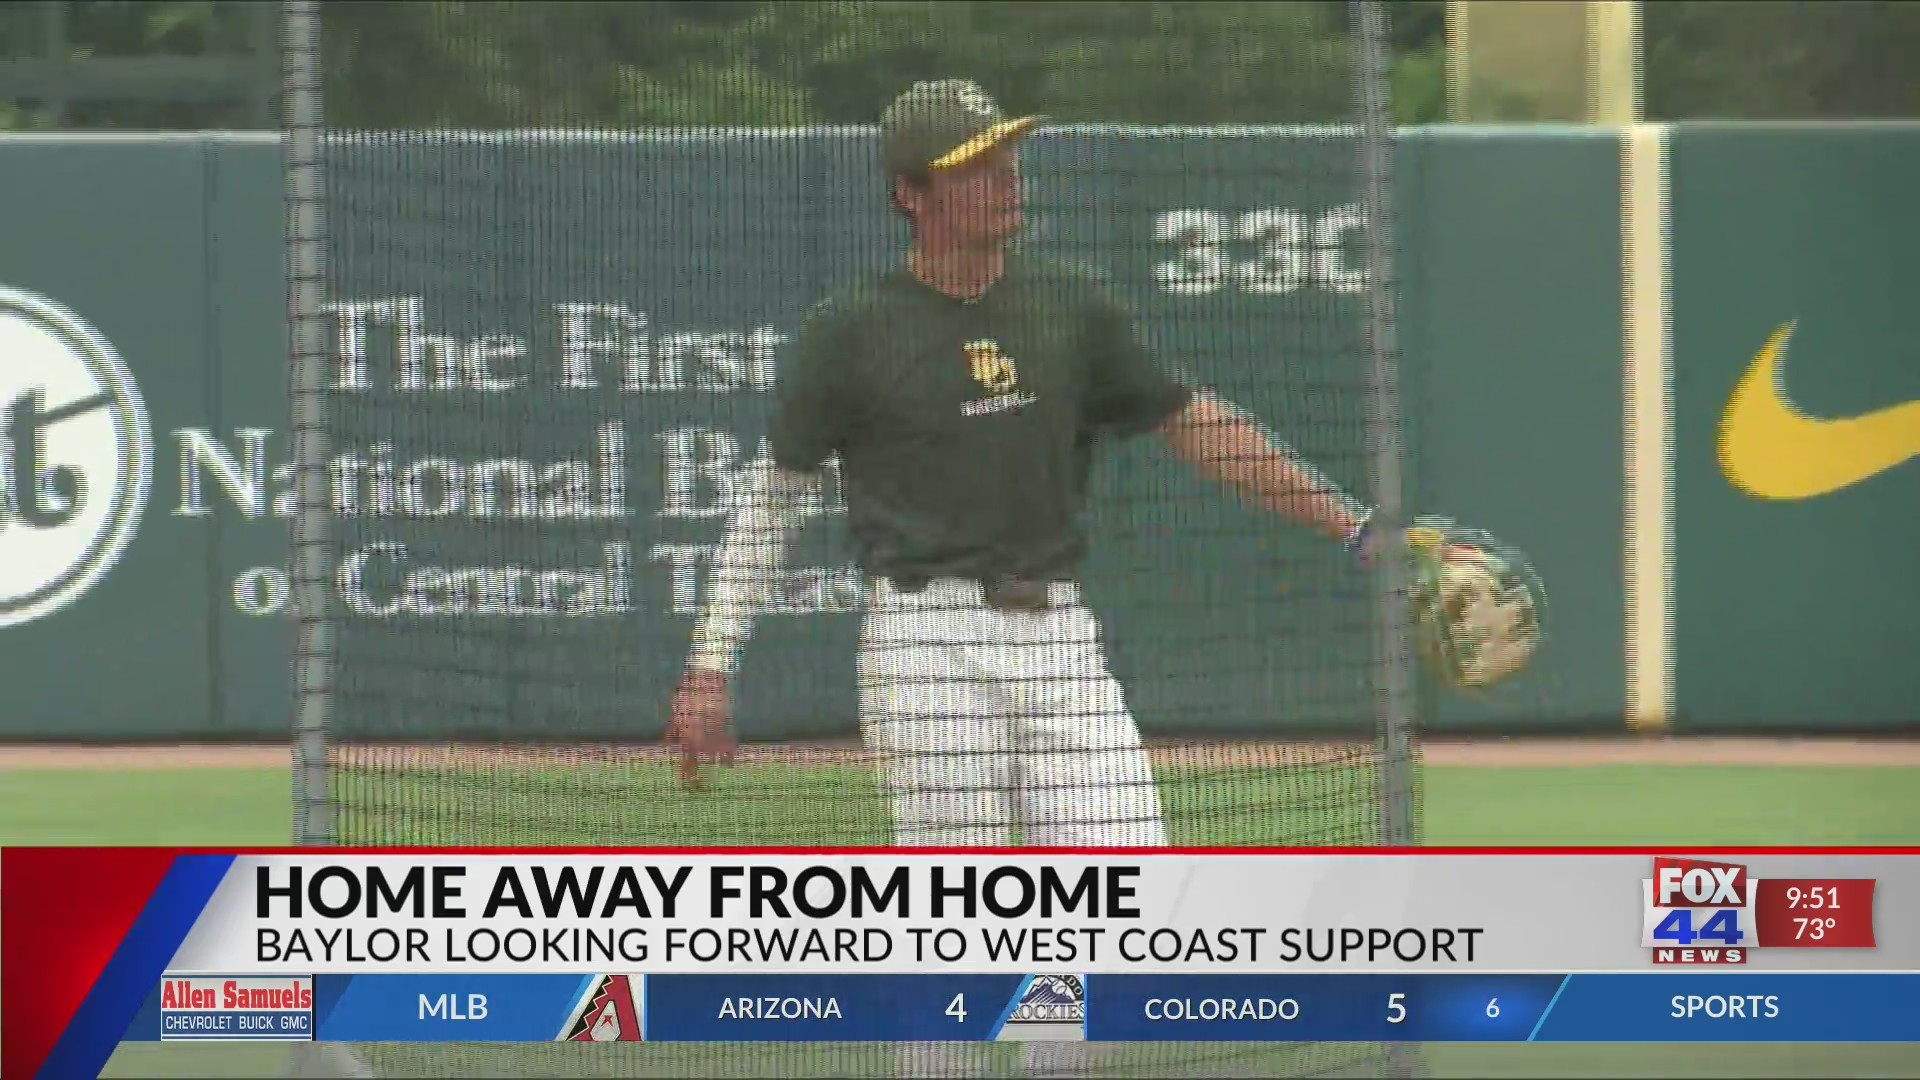 Baylor Baseball: Home Away from Home